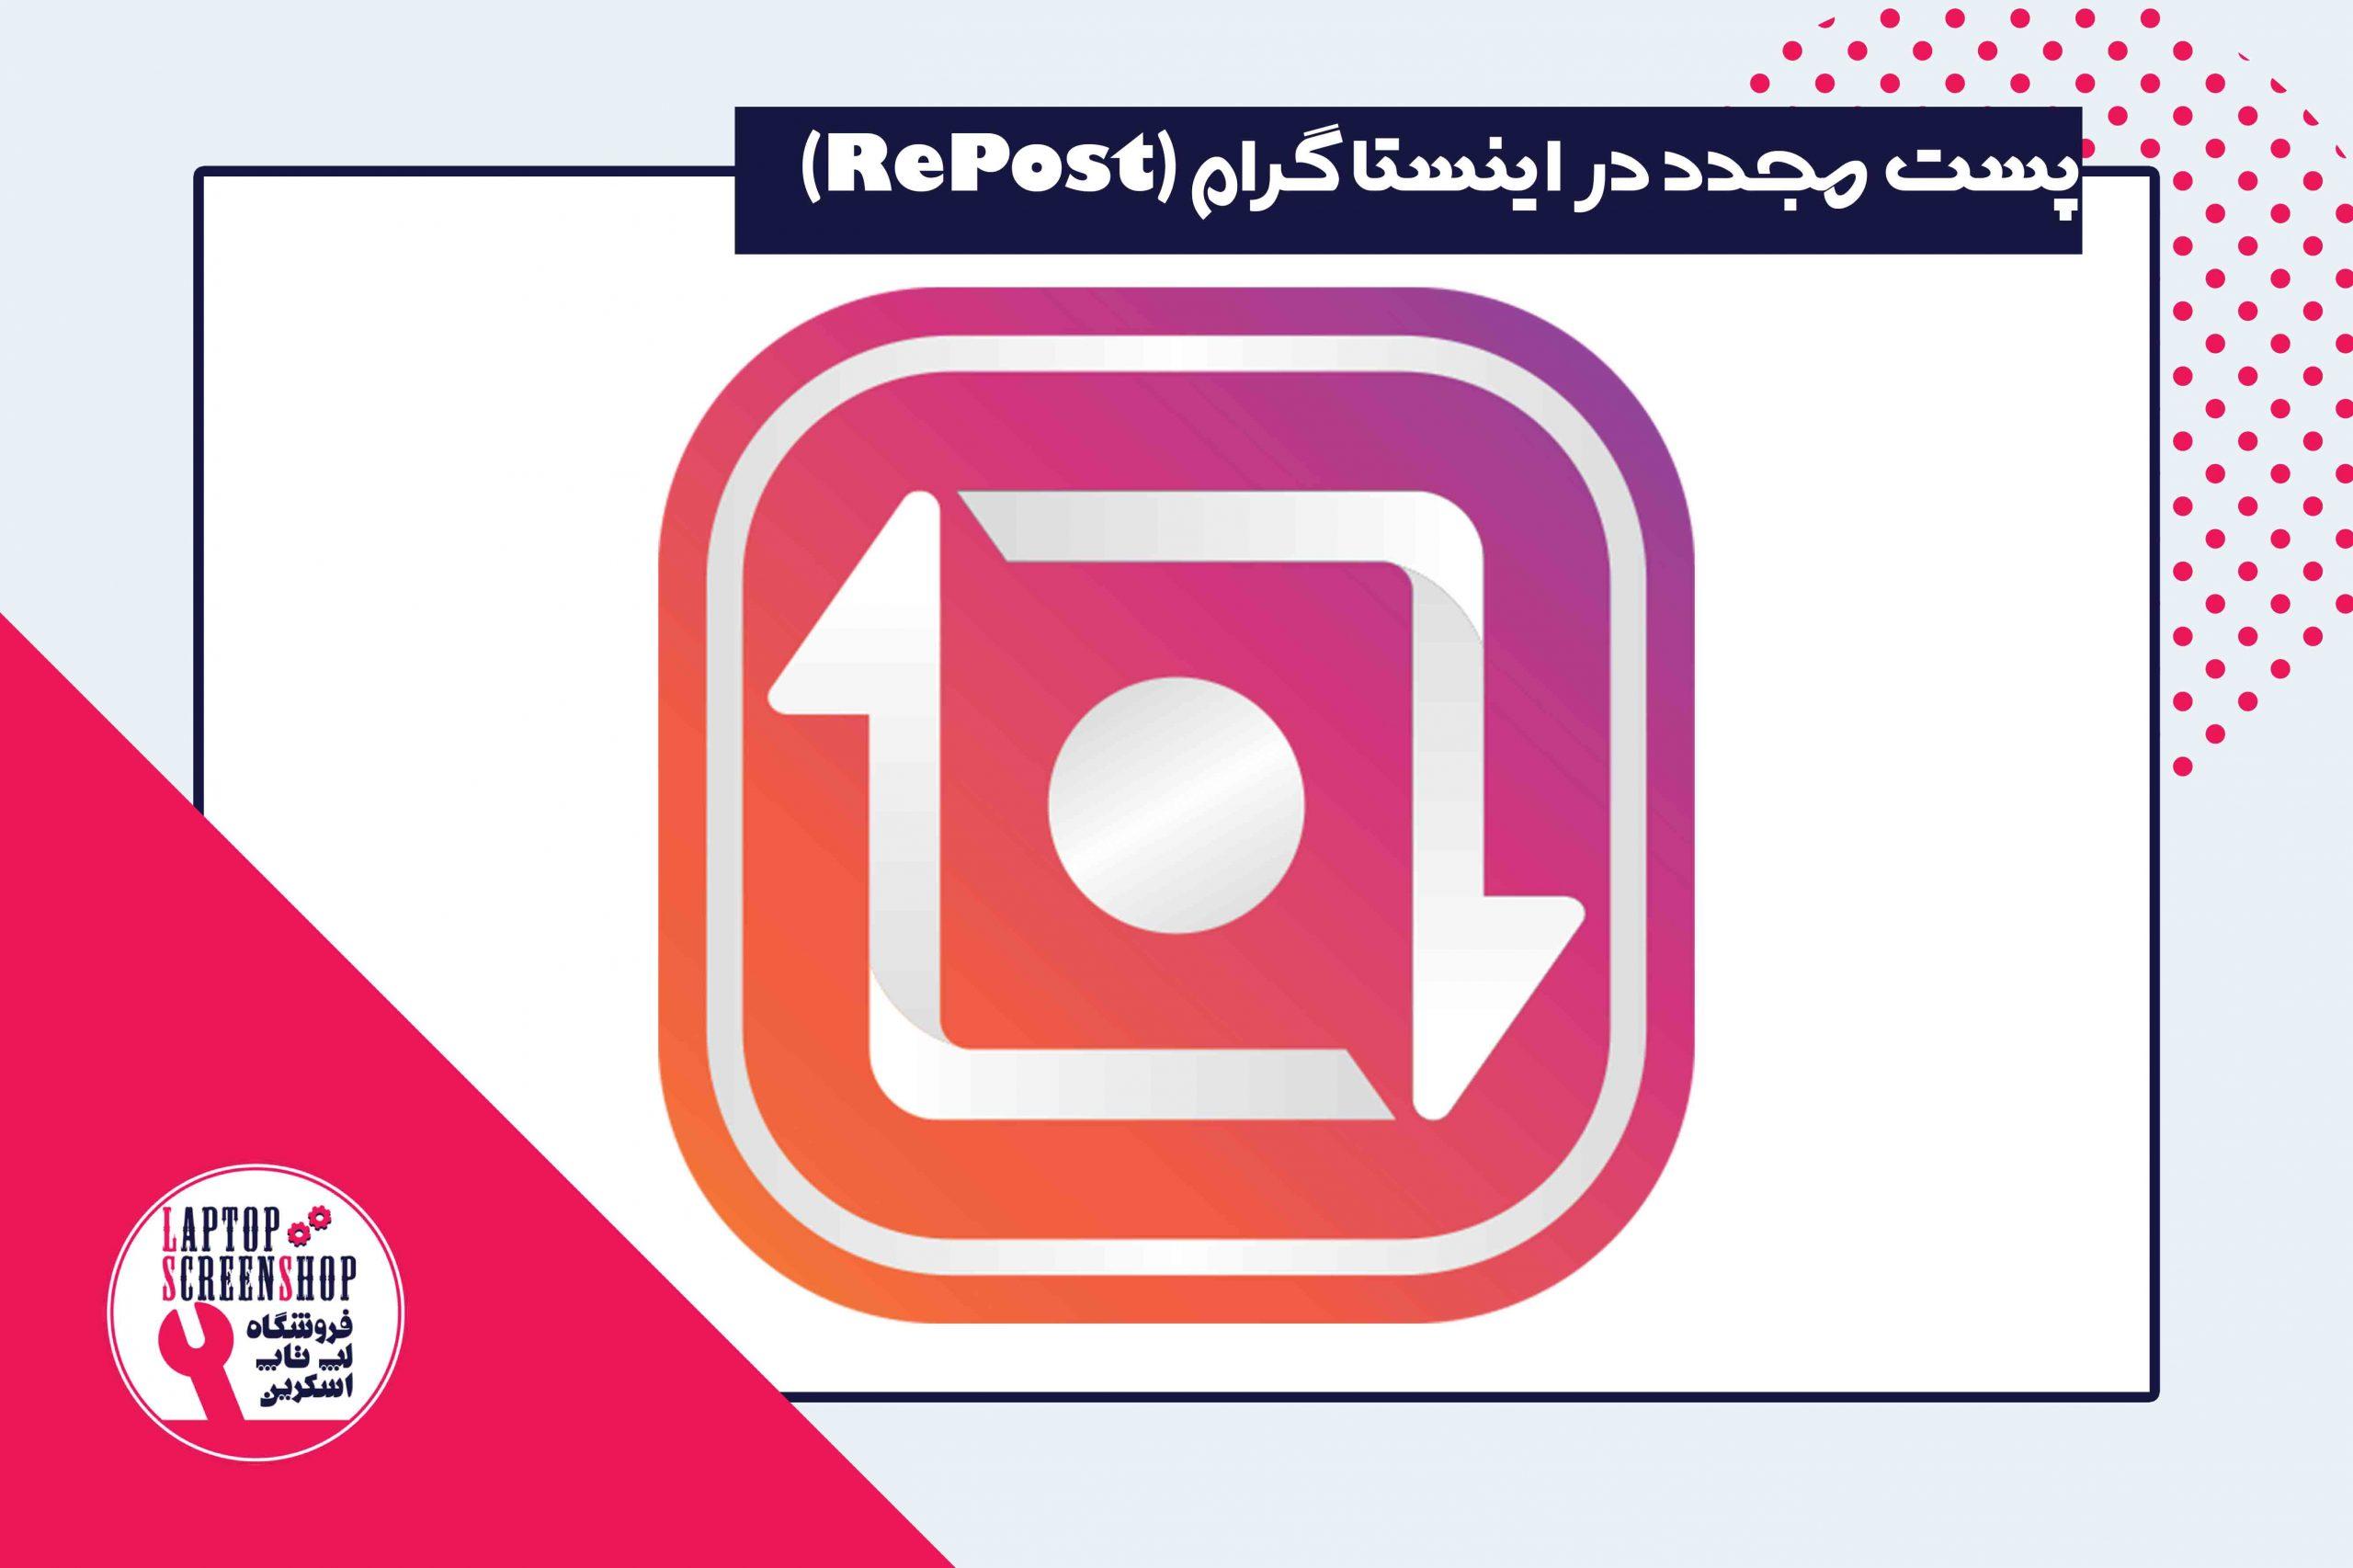 how-to-repost-on-instagram| لپ تاپ اسکرین| ال سی دی| خرید اینترنتی ال سی دی گوشی| تعمیرات گوشی